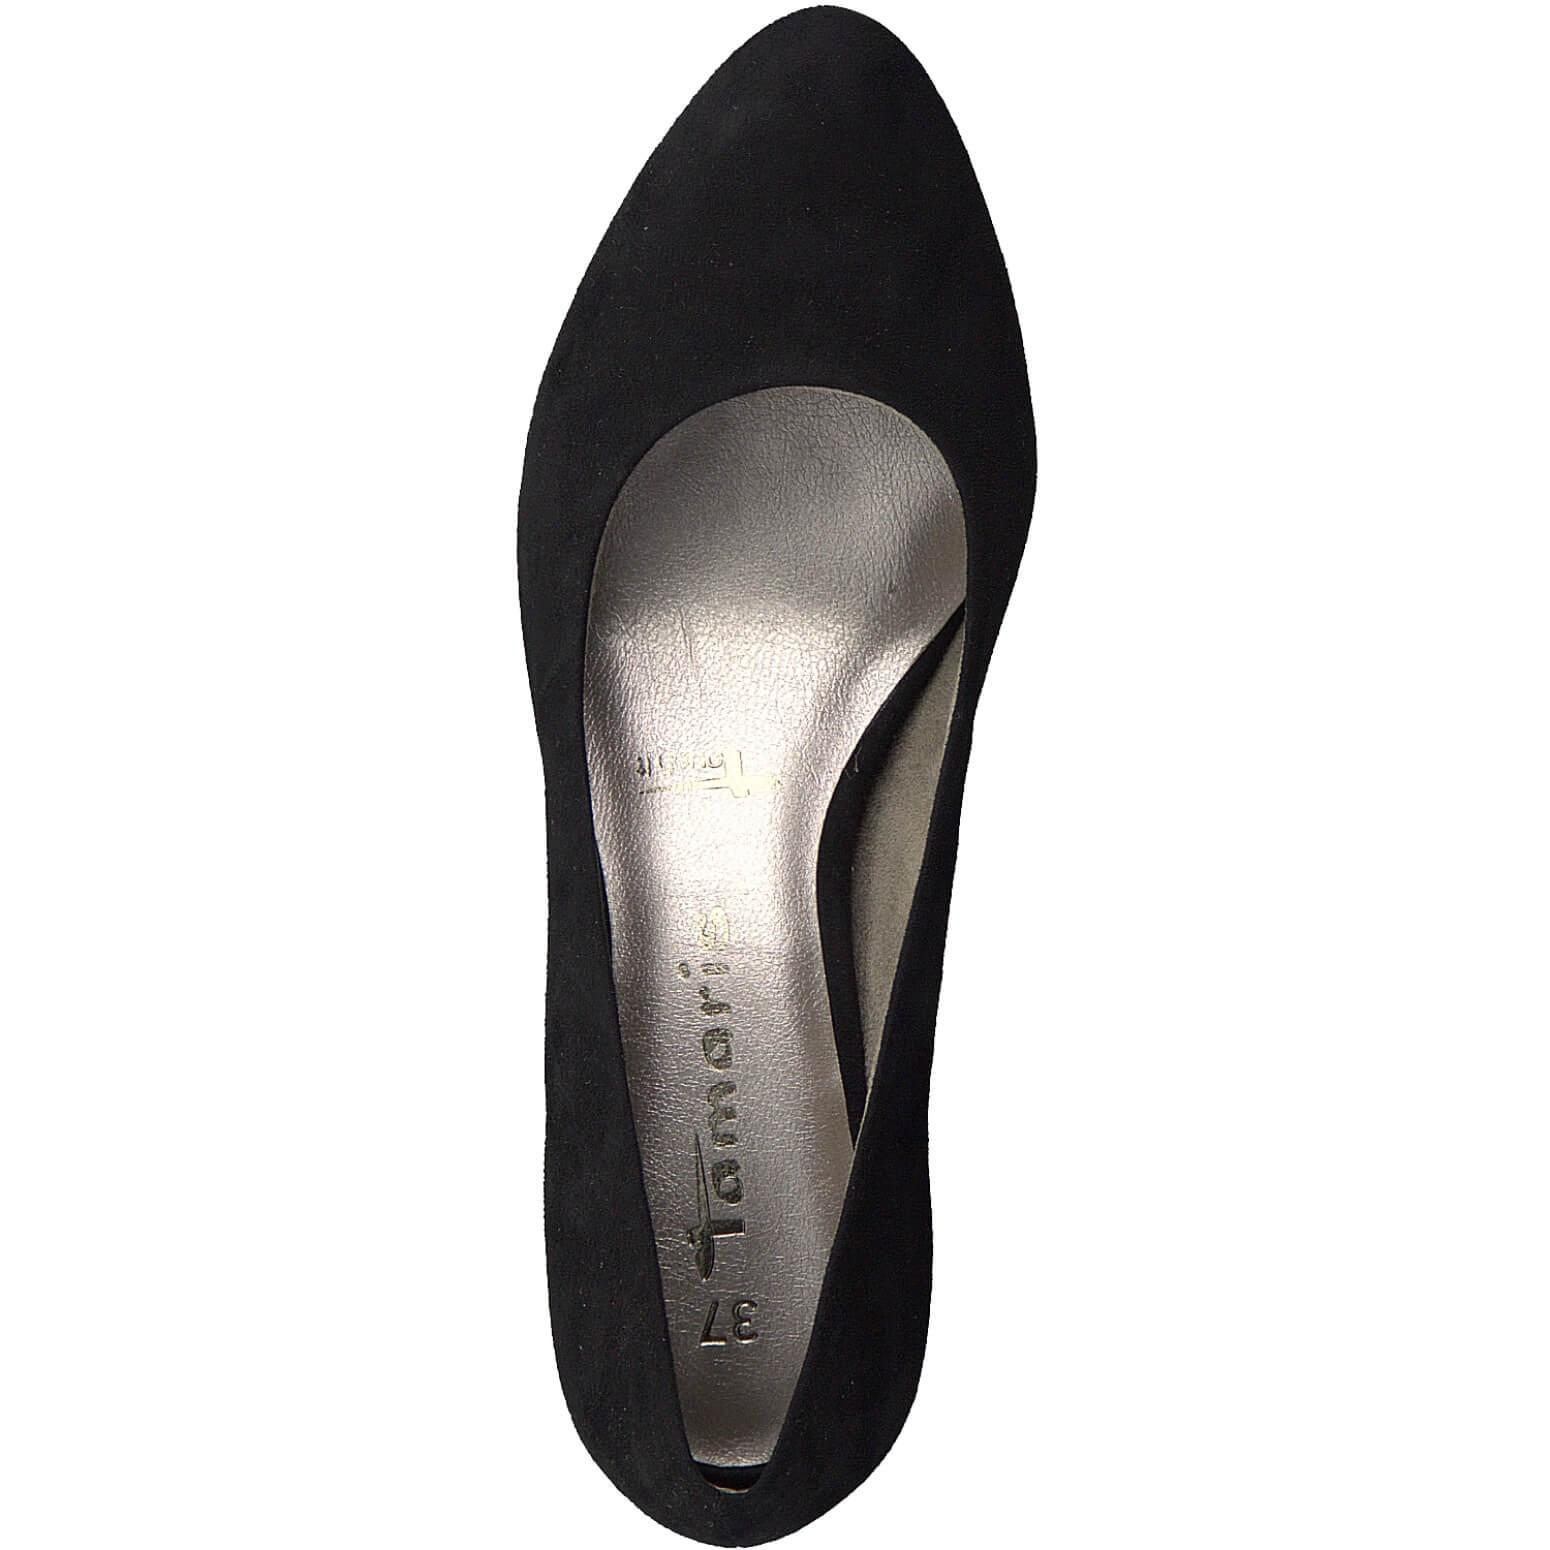 c01a9d4268cc Tamaris Női alkalmi cipő 1-1-22418-22-001 Black | Vivantis.hu - Légy ...